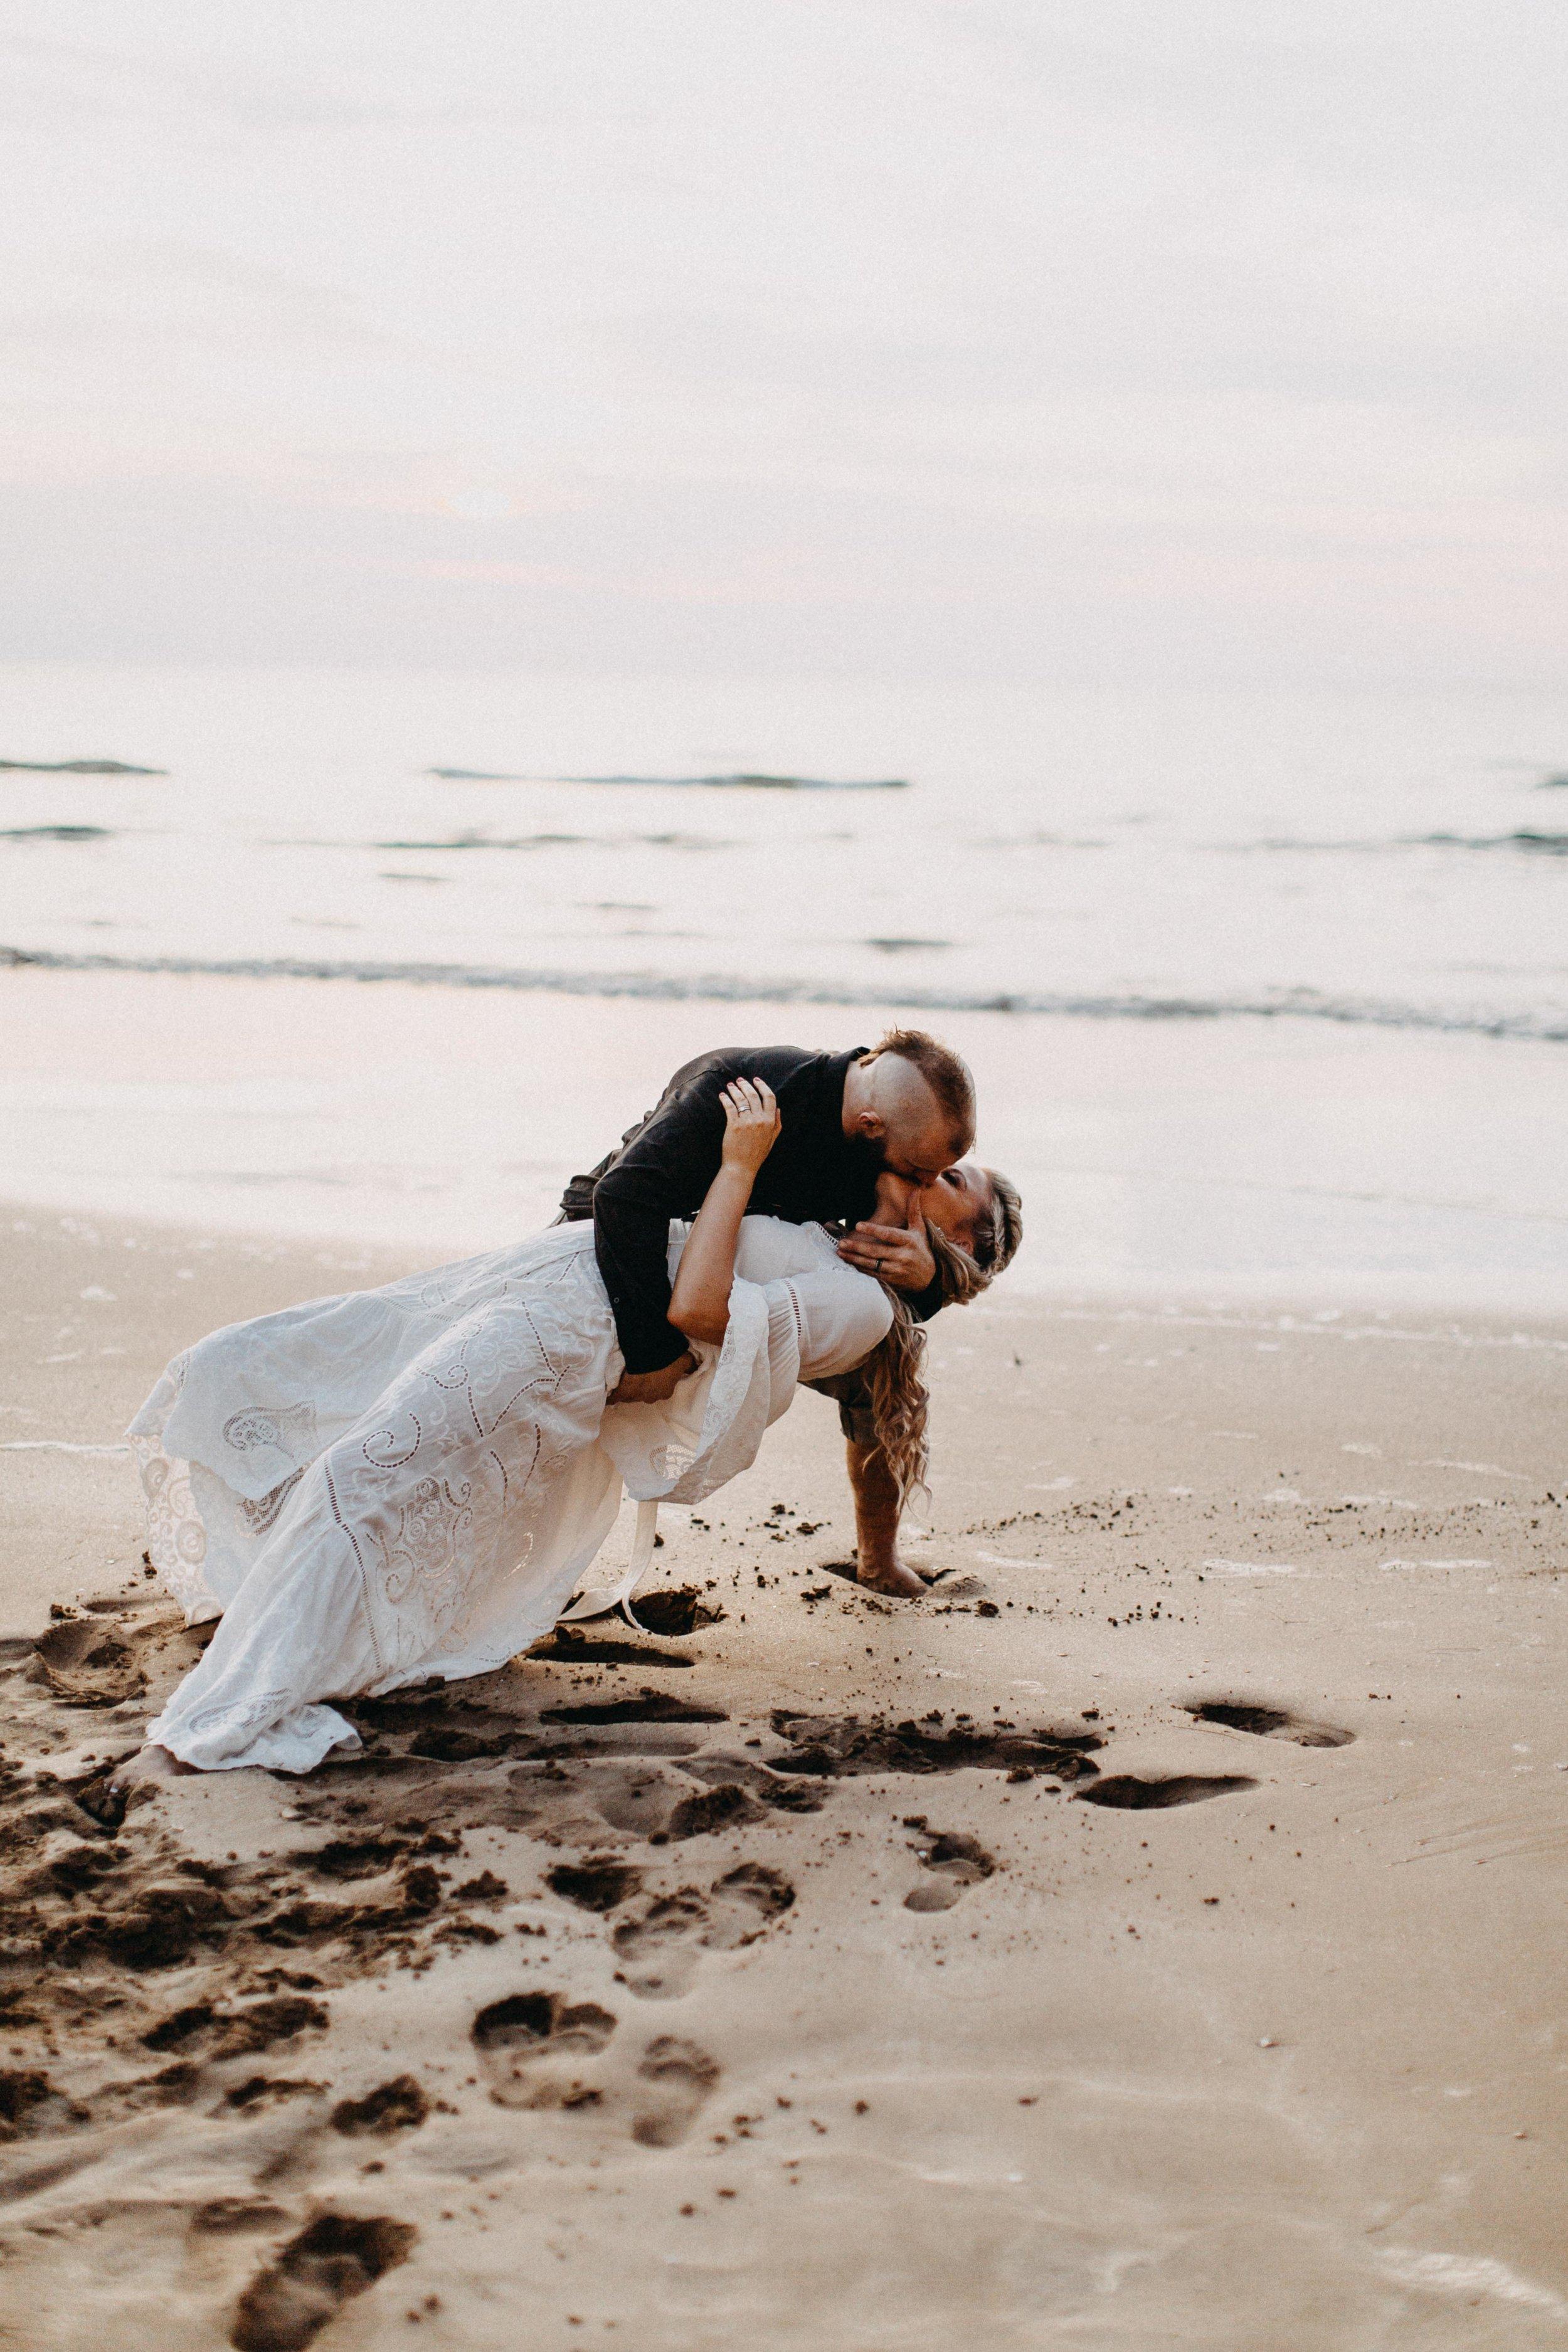 darwin-elopement-wedding-beach-camden-photography-www.emilyobrienphotography.net-93.jpg